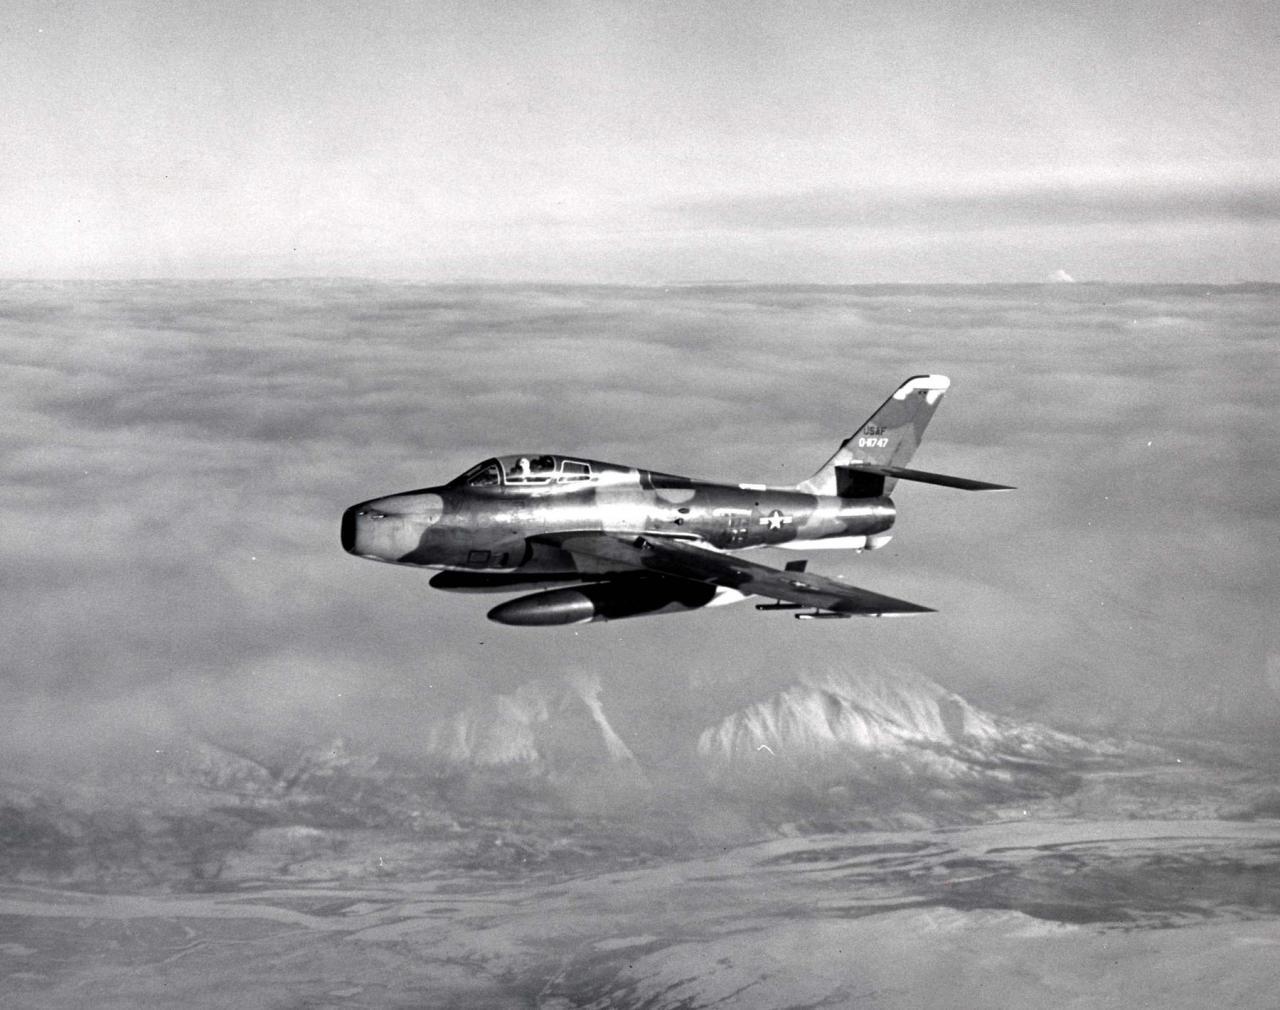 F-84F-25-RE (SN 51-1747) of the 162nd TFS - Minimonde76